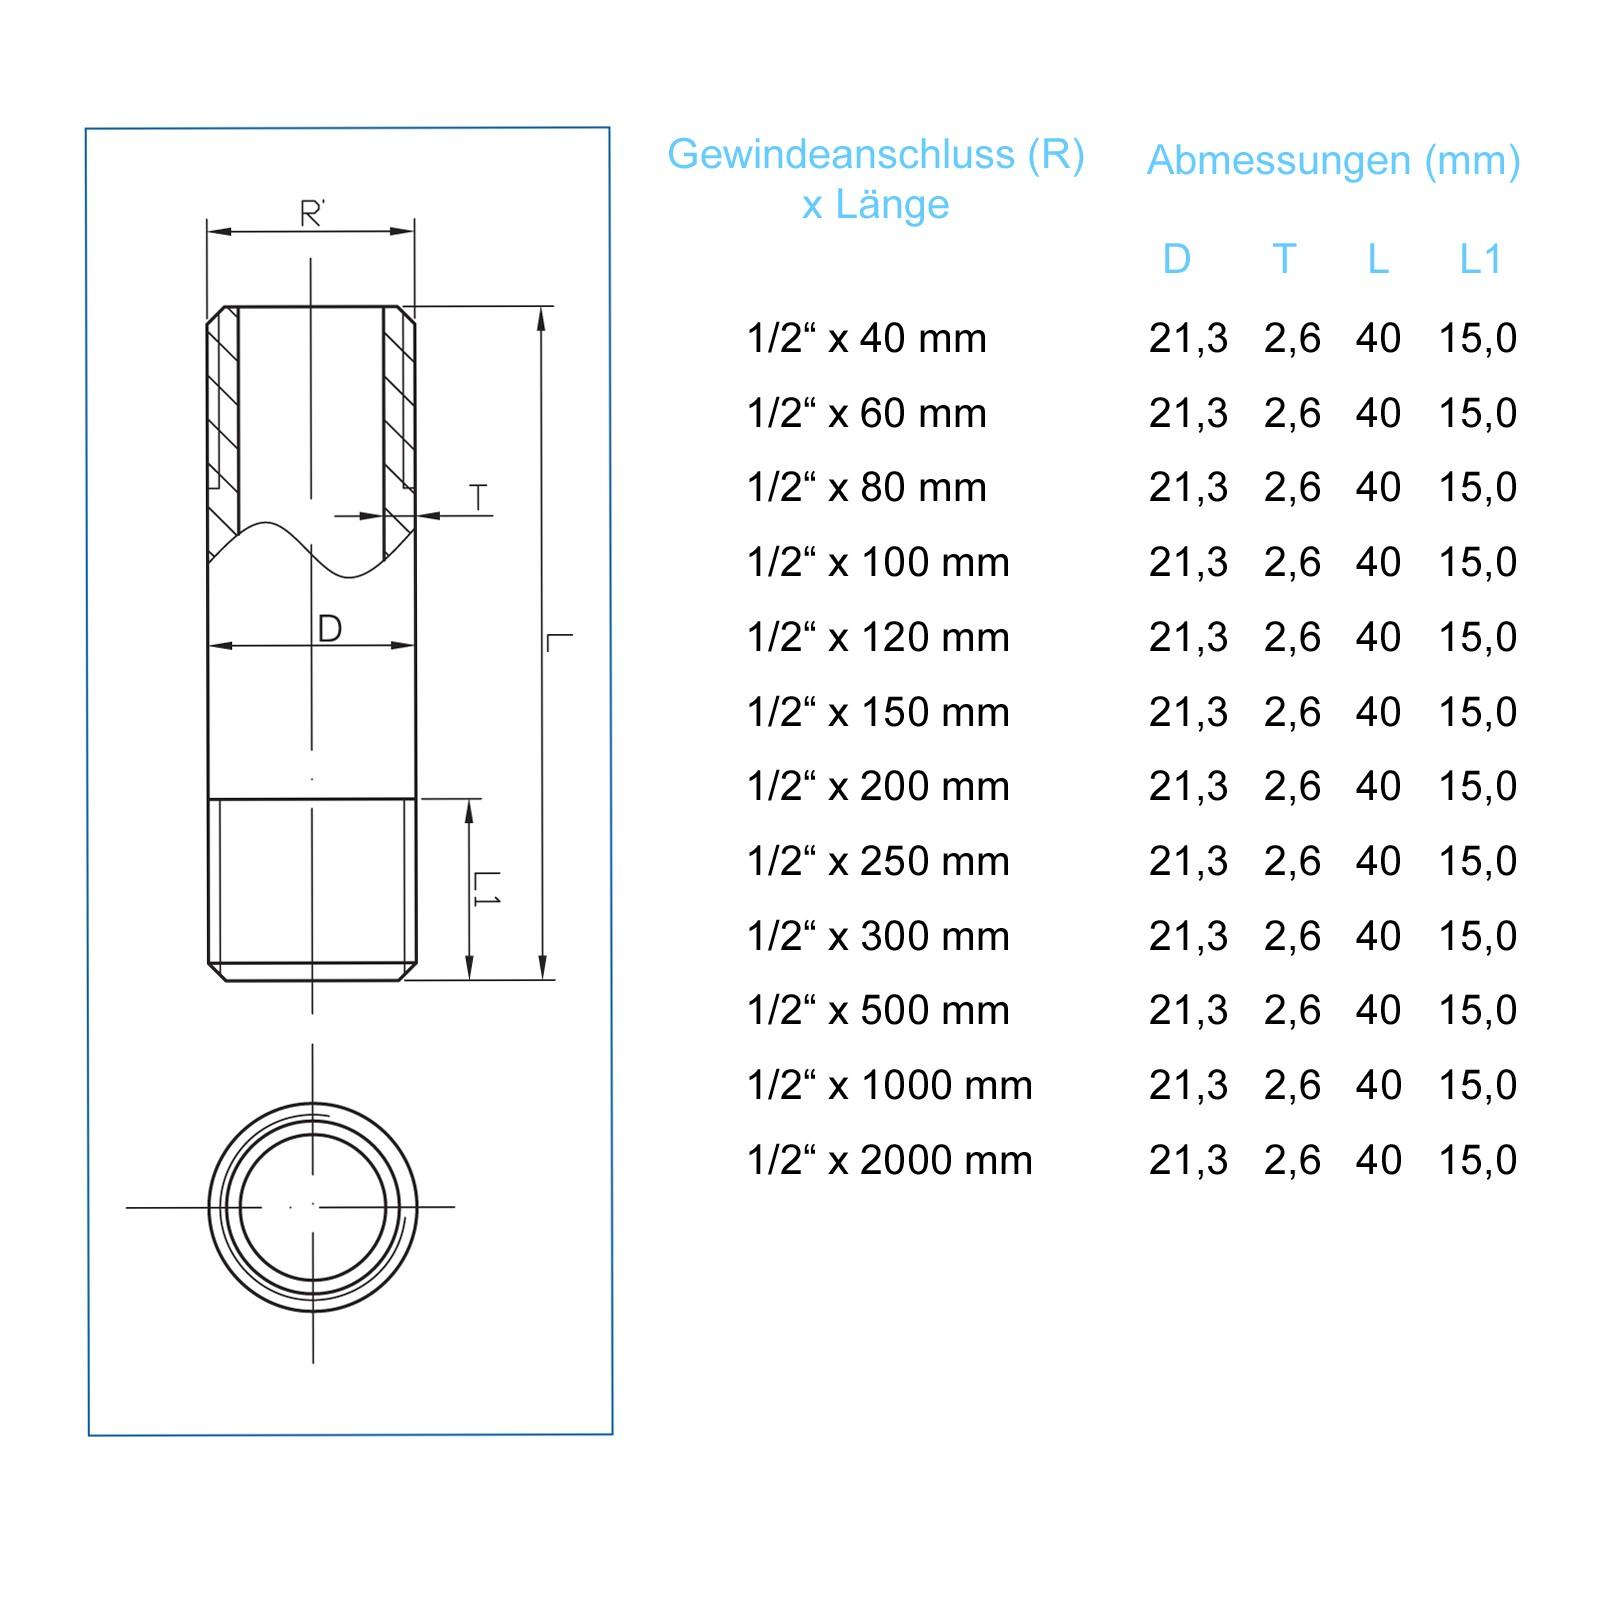 rohrdoppelnippel 1 2 zoll 21 3 x 60 mm dn15 rohrnippel. Black Bedroom Furniture Sets. Home Design Ideas